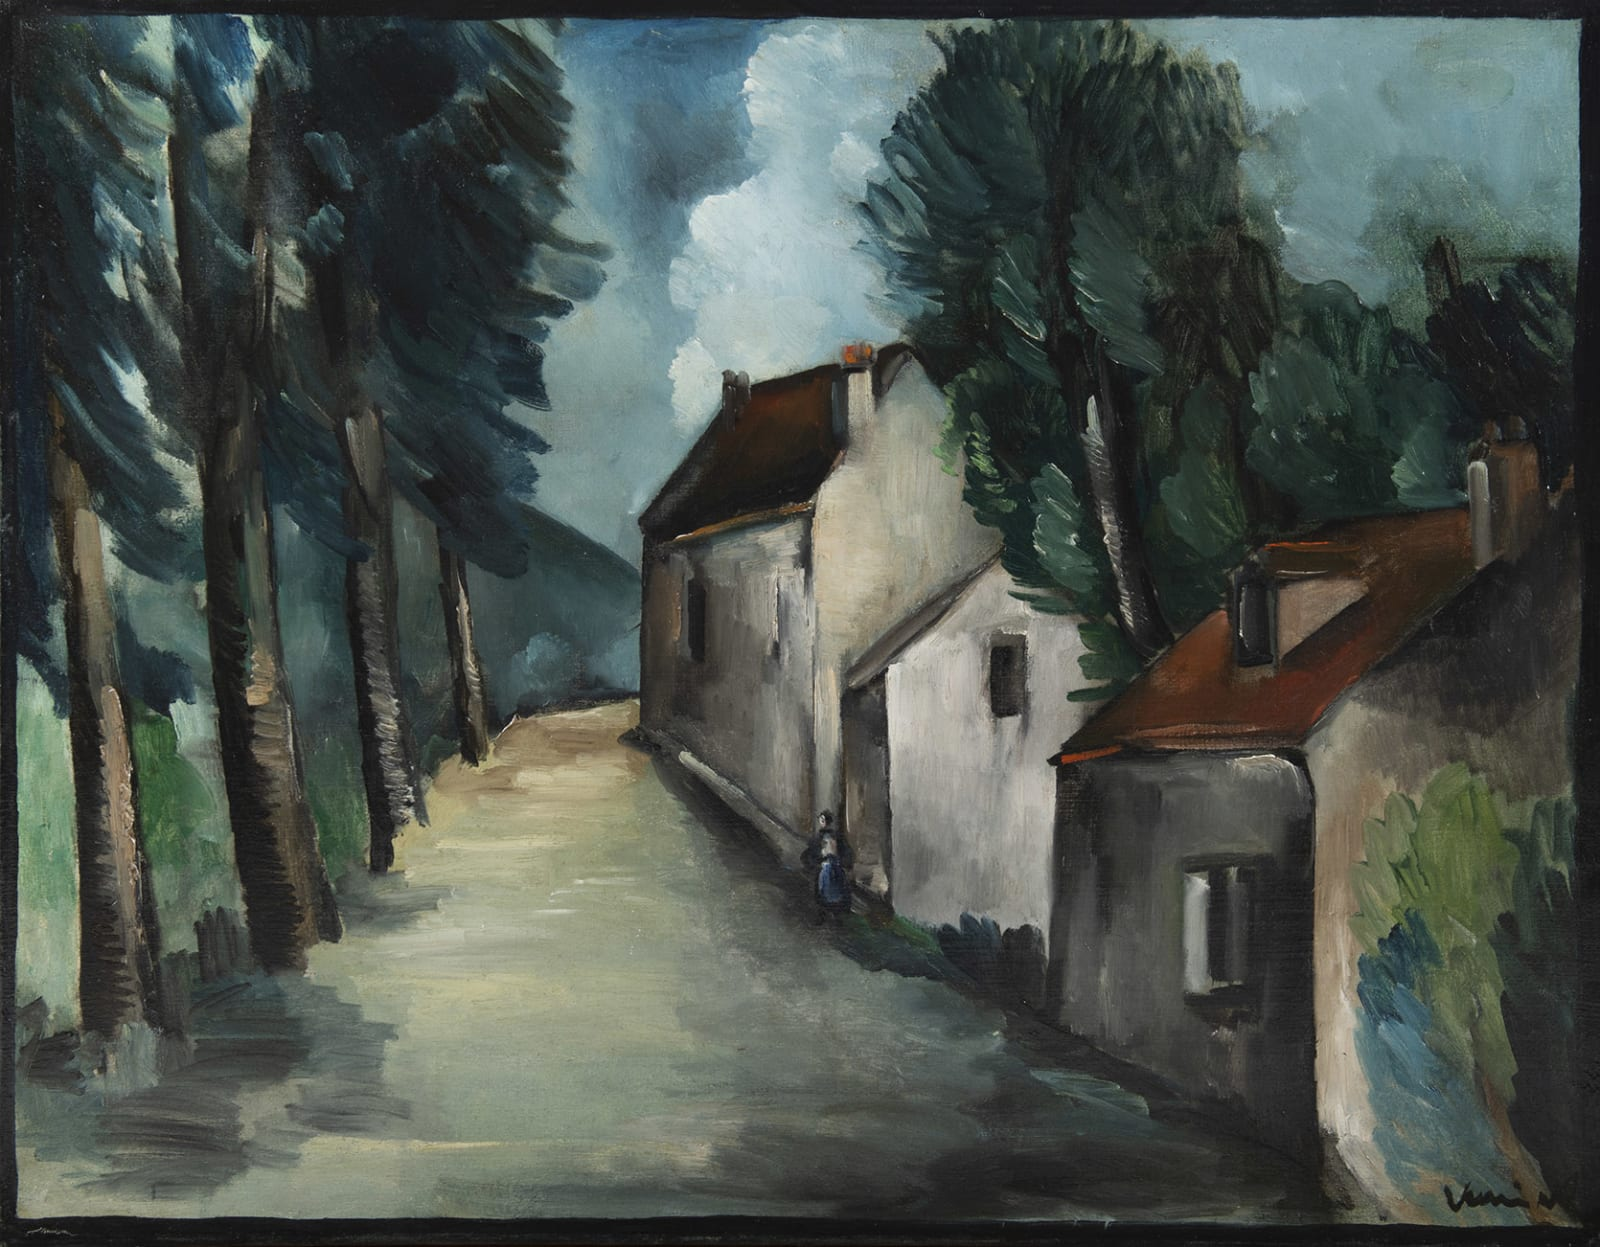 MAURICE DE VLAMINCK, Rue de village, 1912